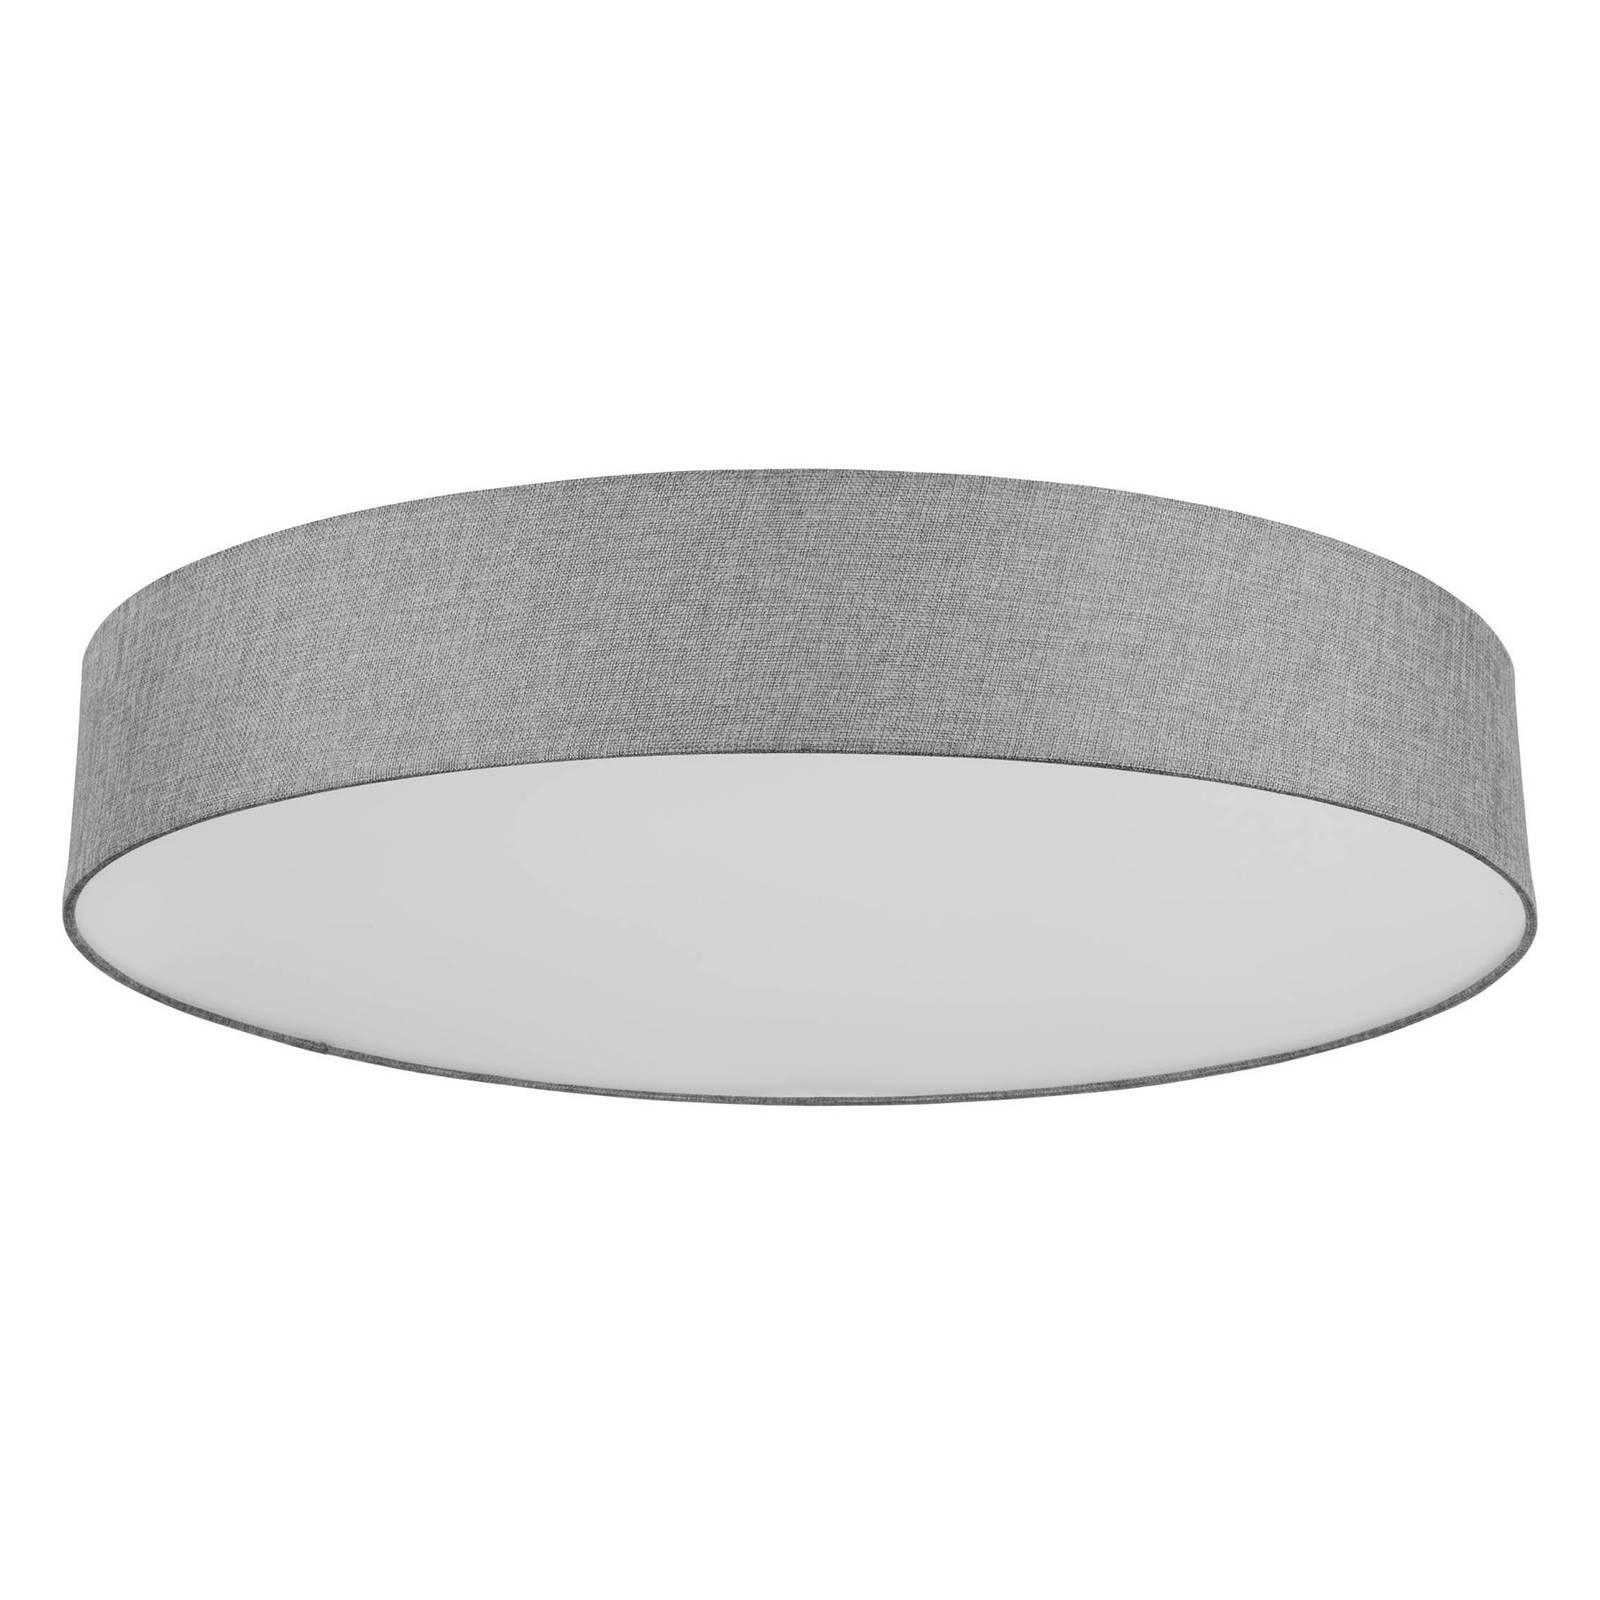 EGLO connect Ramao-C-LED-kattovalaisin harmaa 76cm